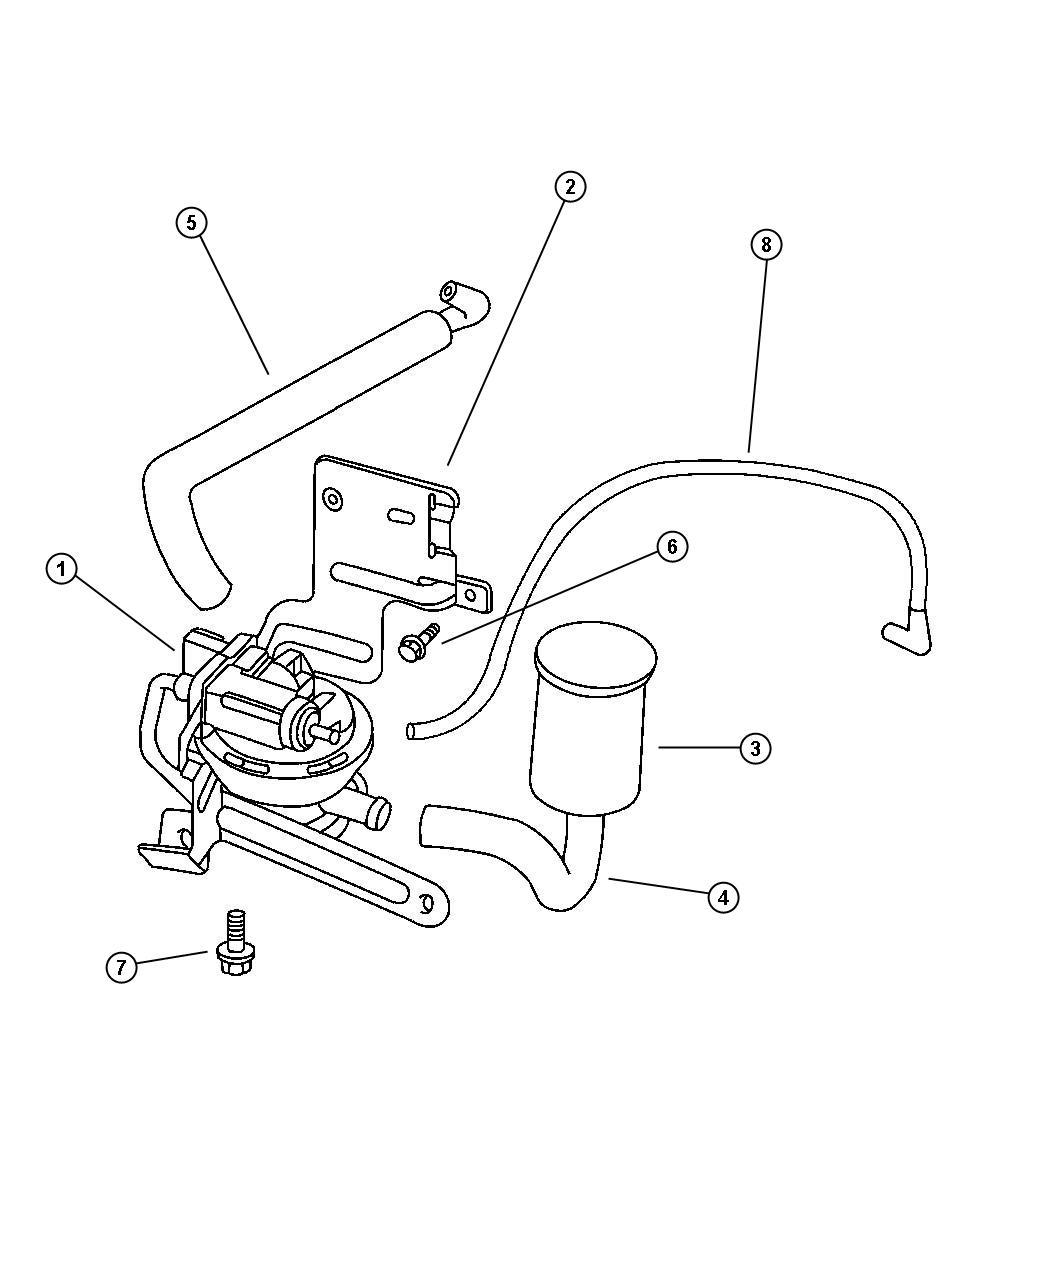 Jeep Cherokee Pump Leak Detection Emissions